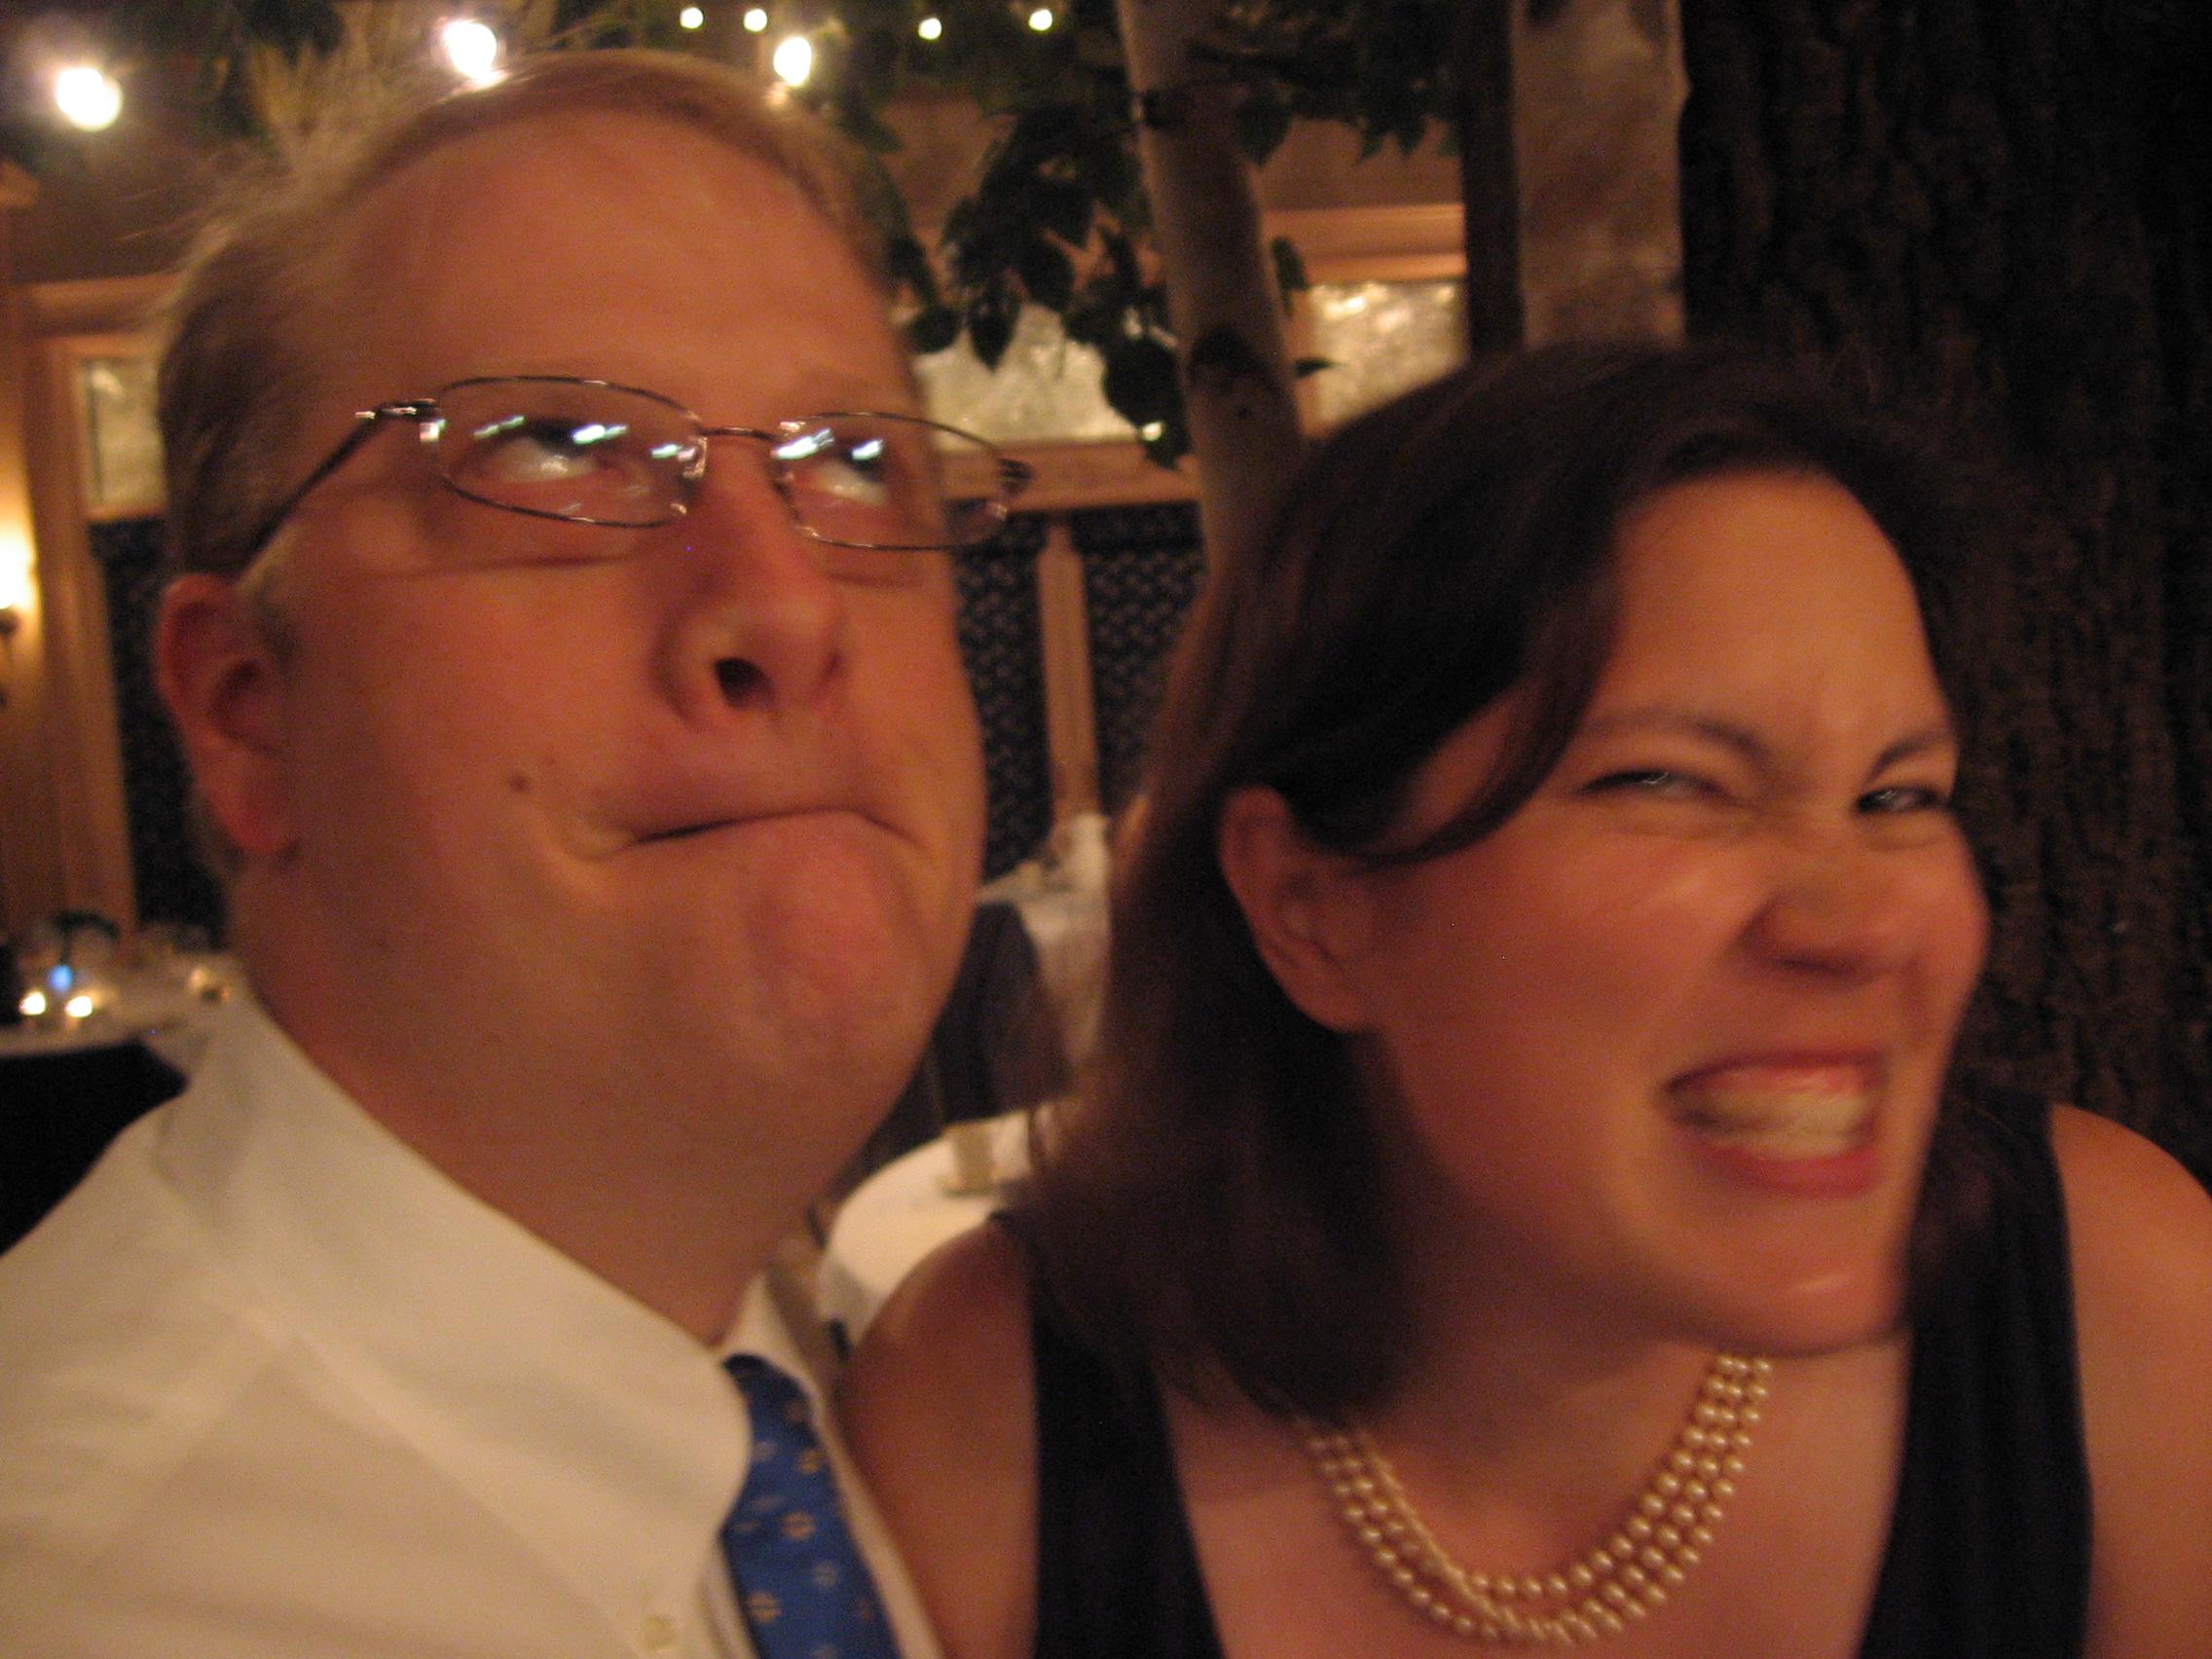 Wedding antics